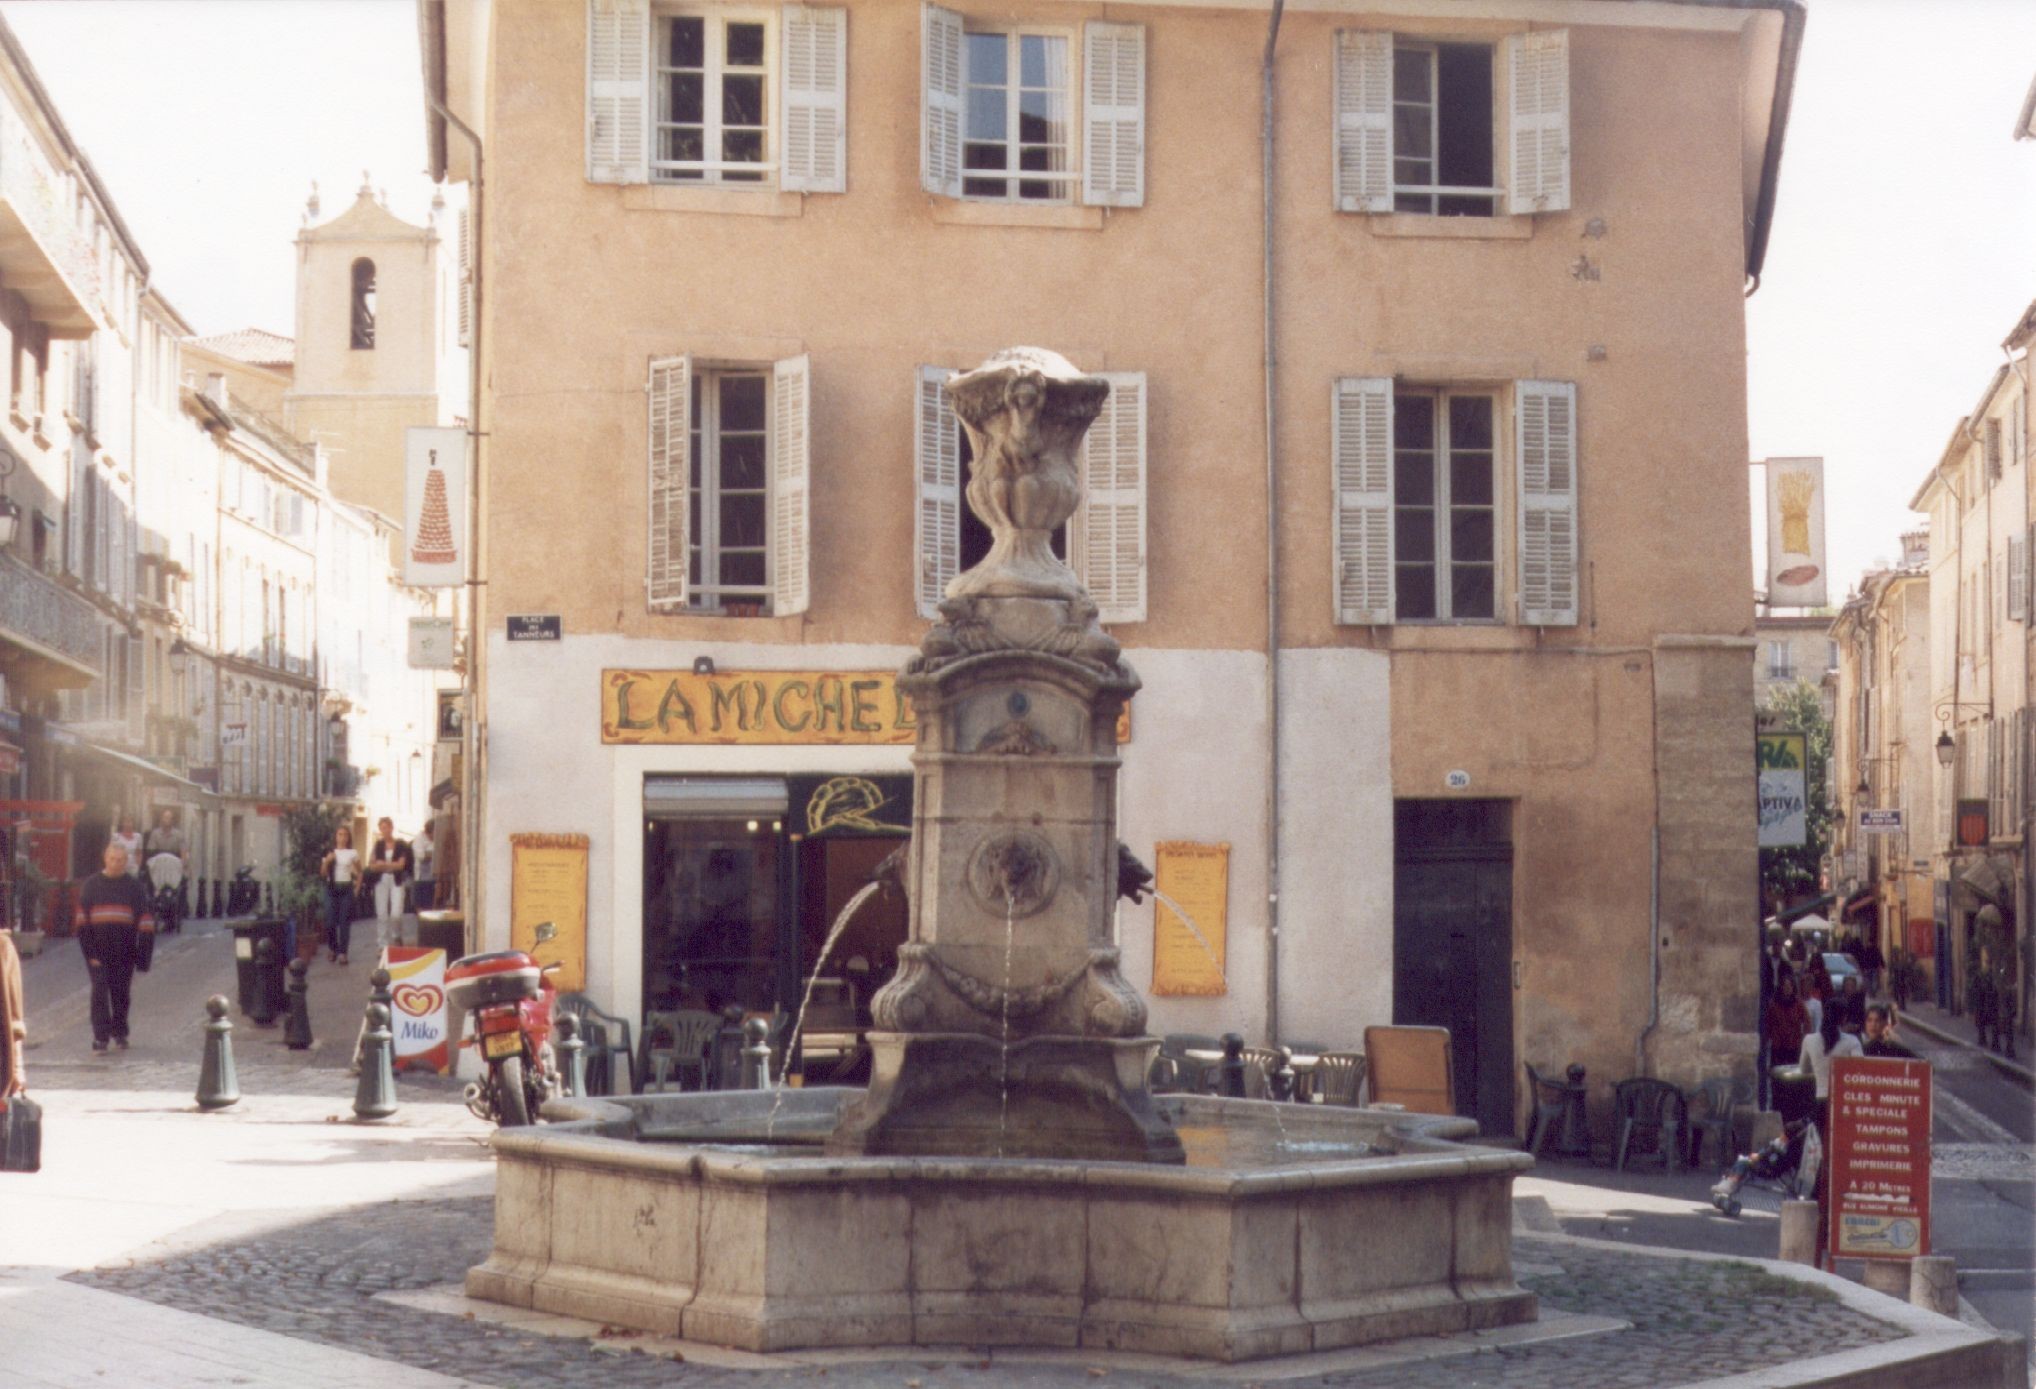 The coat of arms of Aix-en-Provence